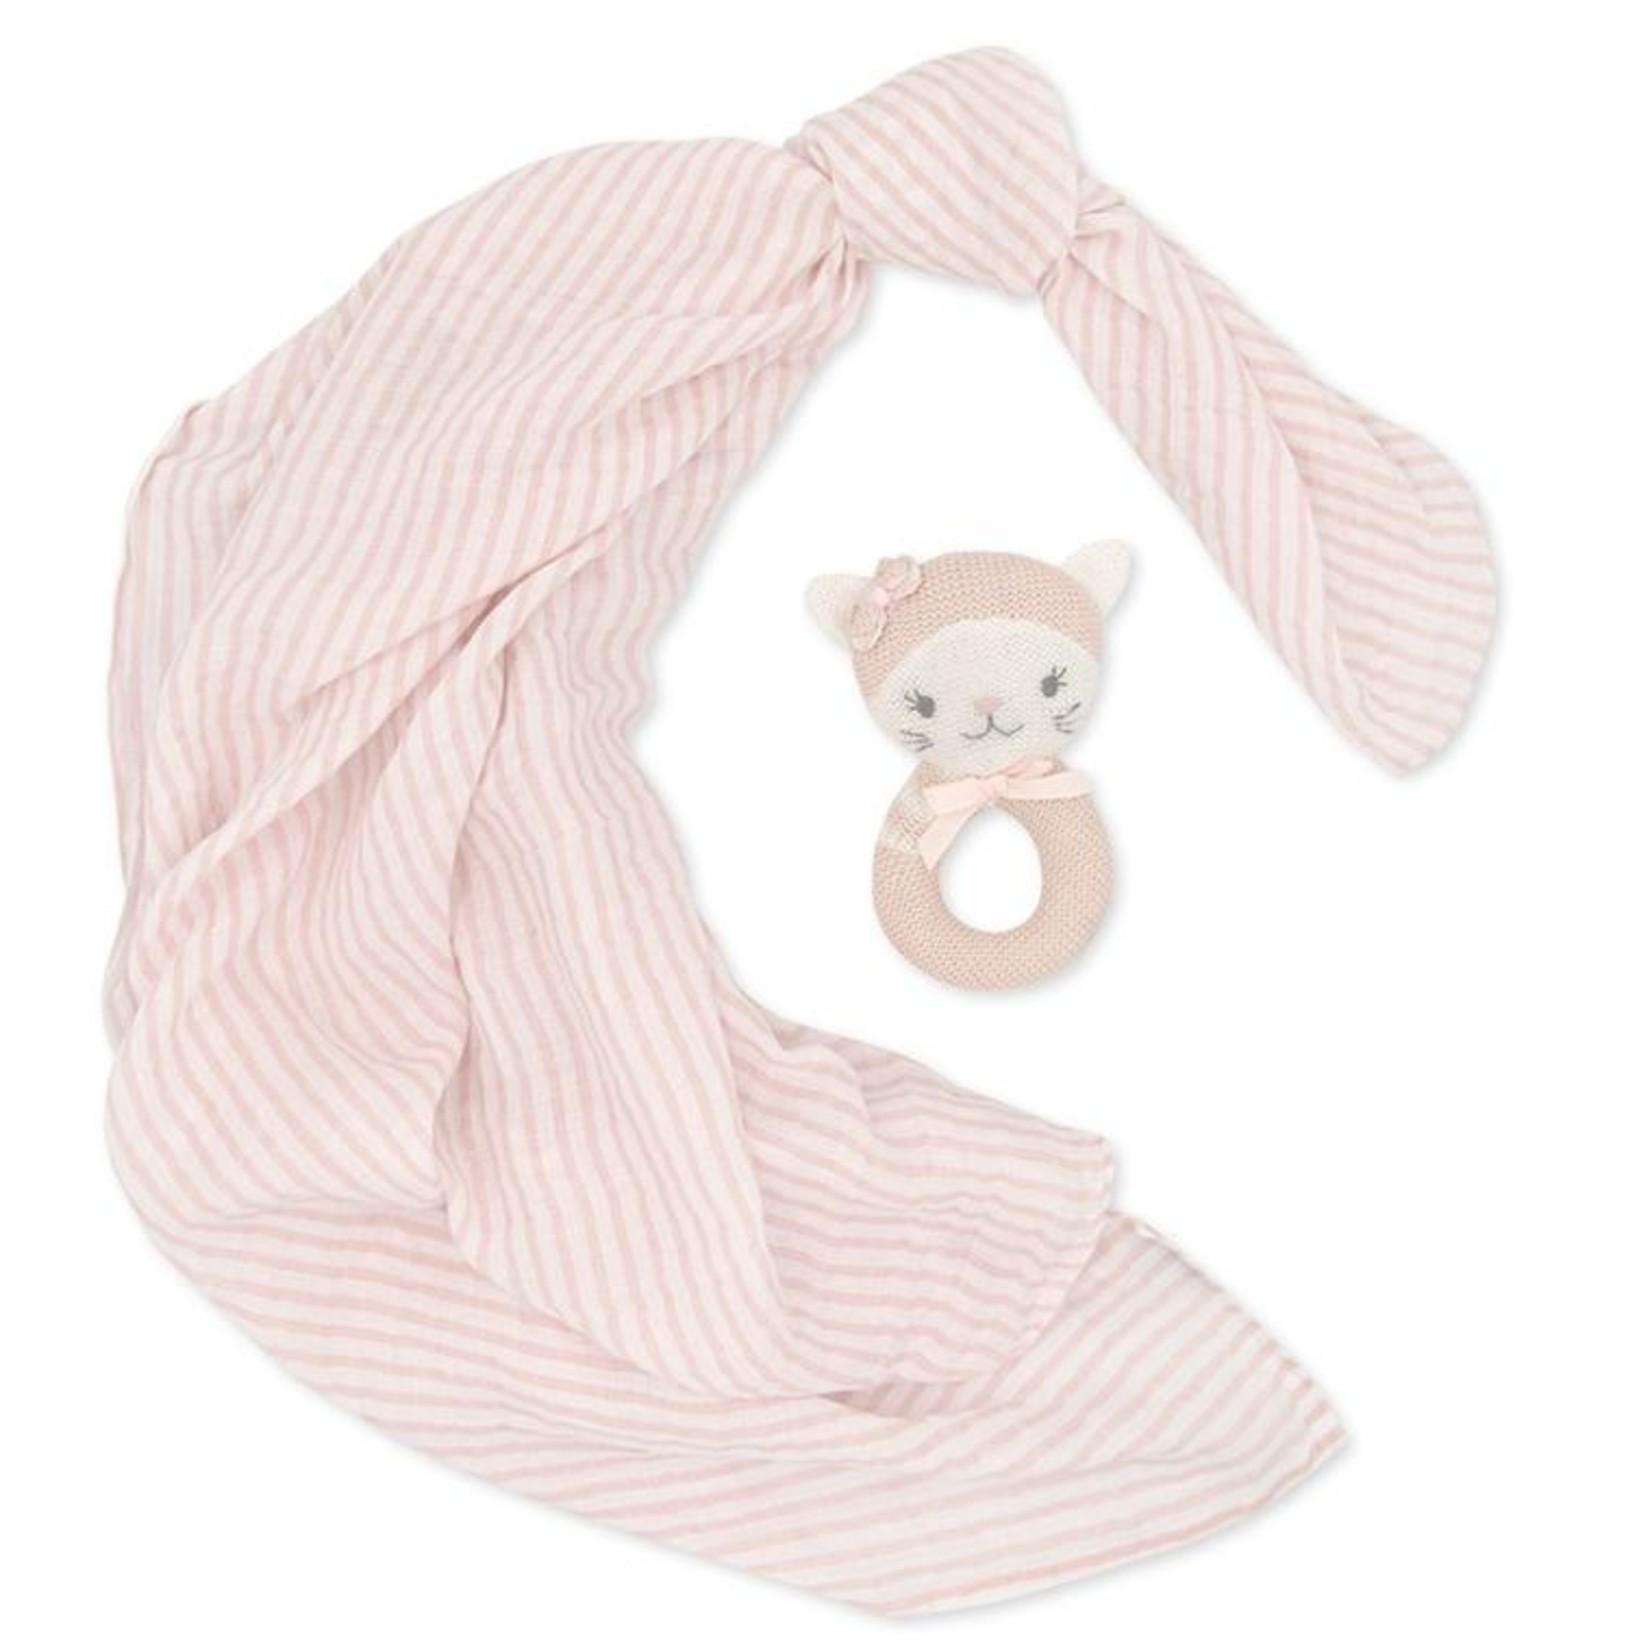 Living Textiles Living Textiles Muslin Swaddle & Rattle - Cat/Blush Stripe